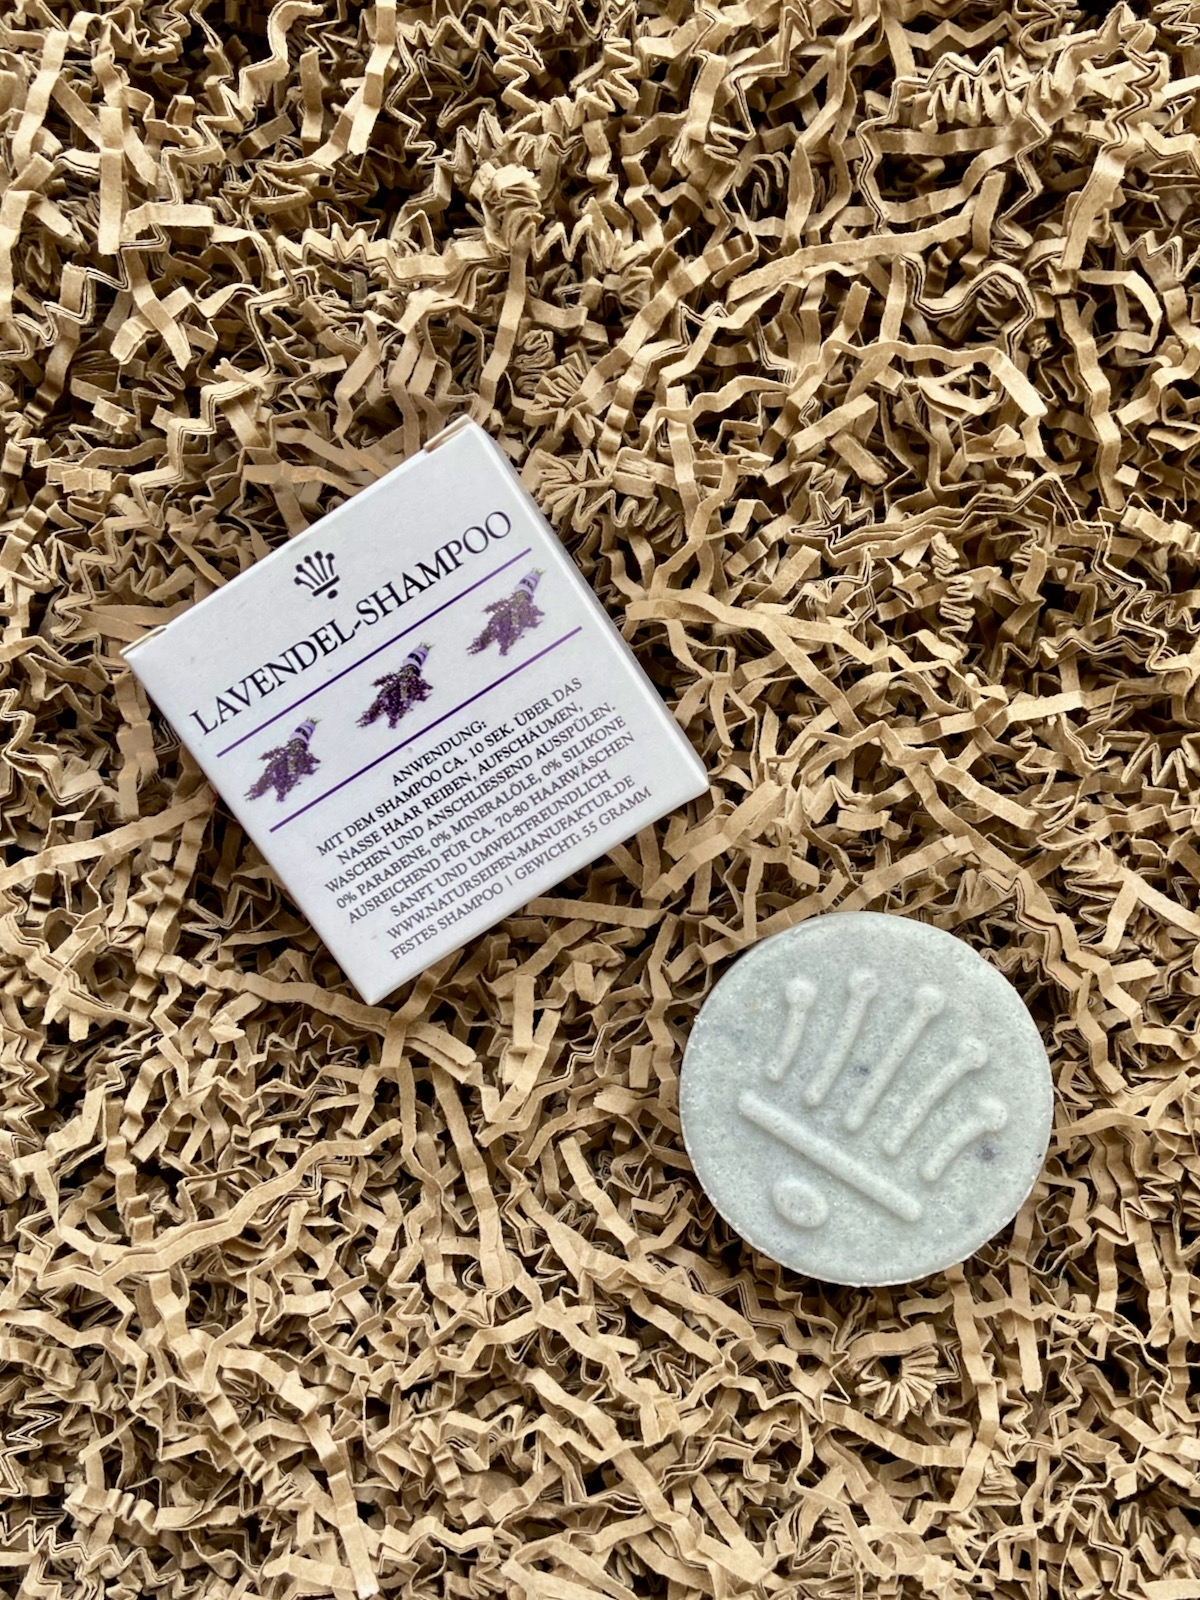 Naturseifen Manufaktur Uckermark Lavendel-Shampoo